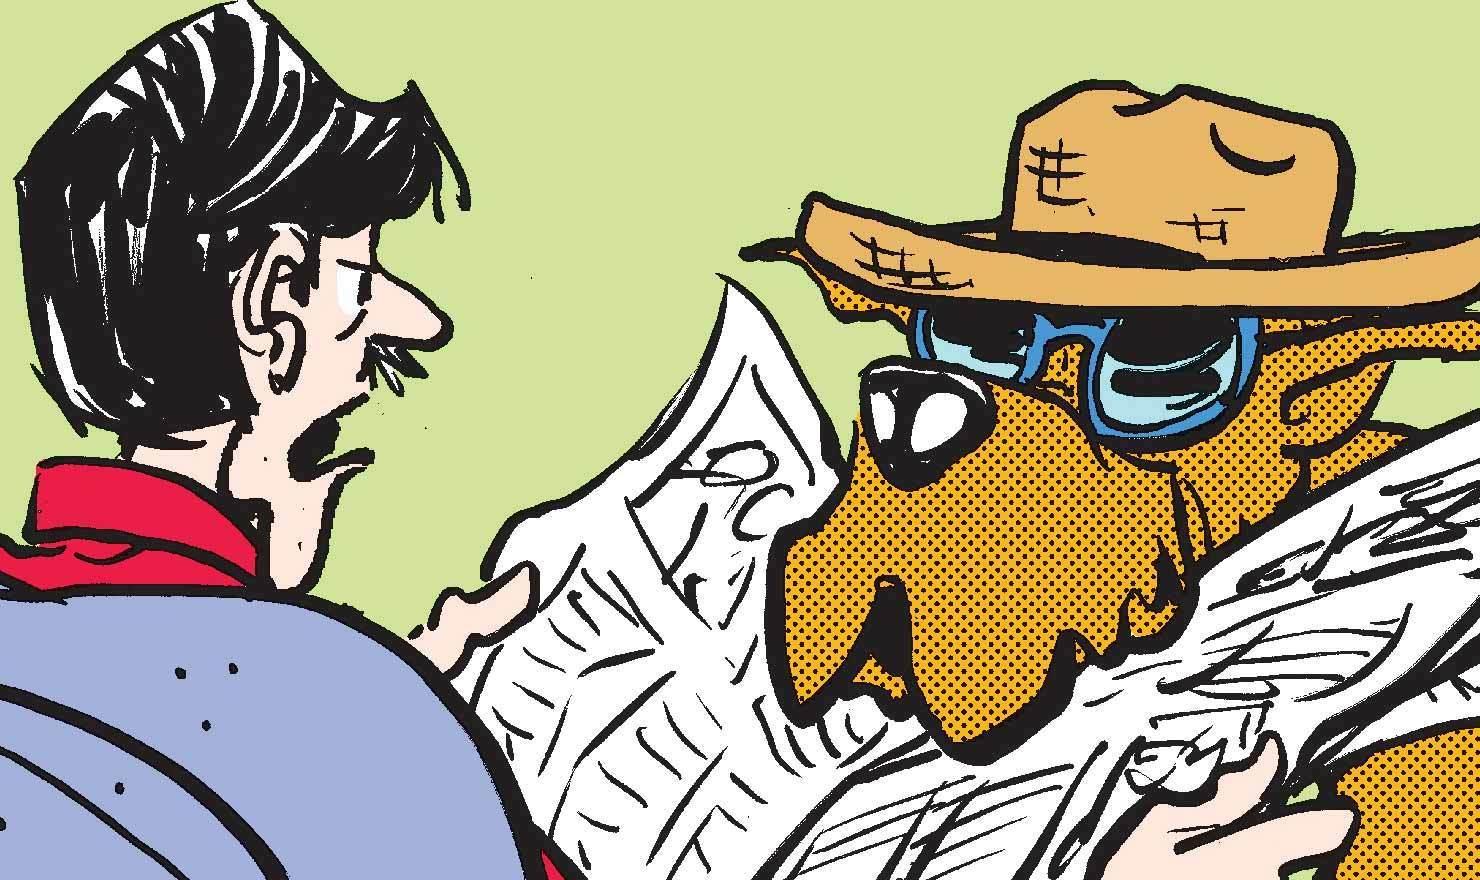 Celebrate National Sunglasses Day The Marmaduke Way